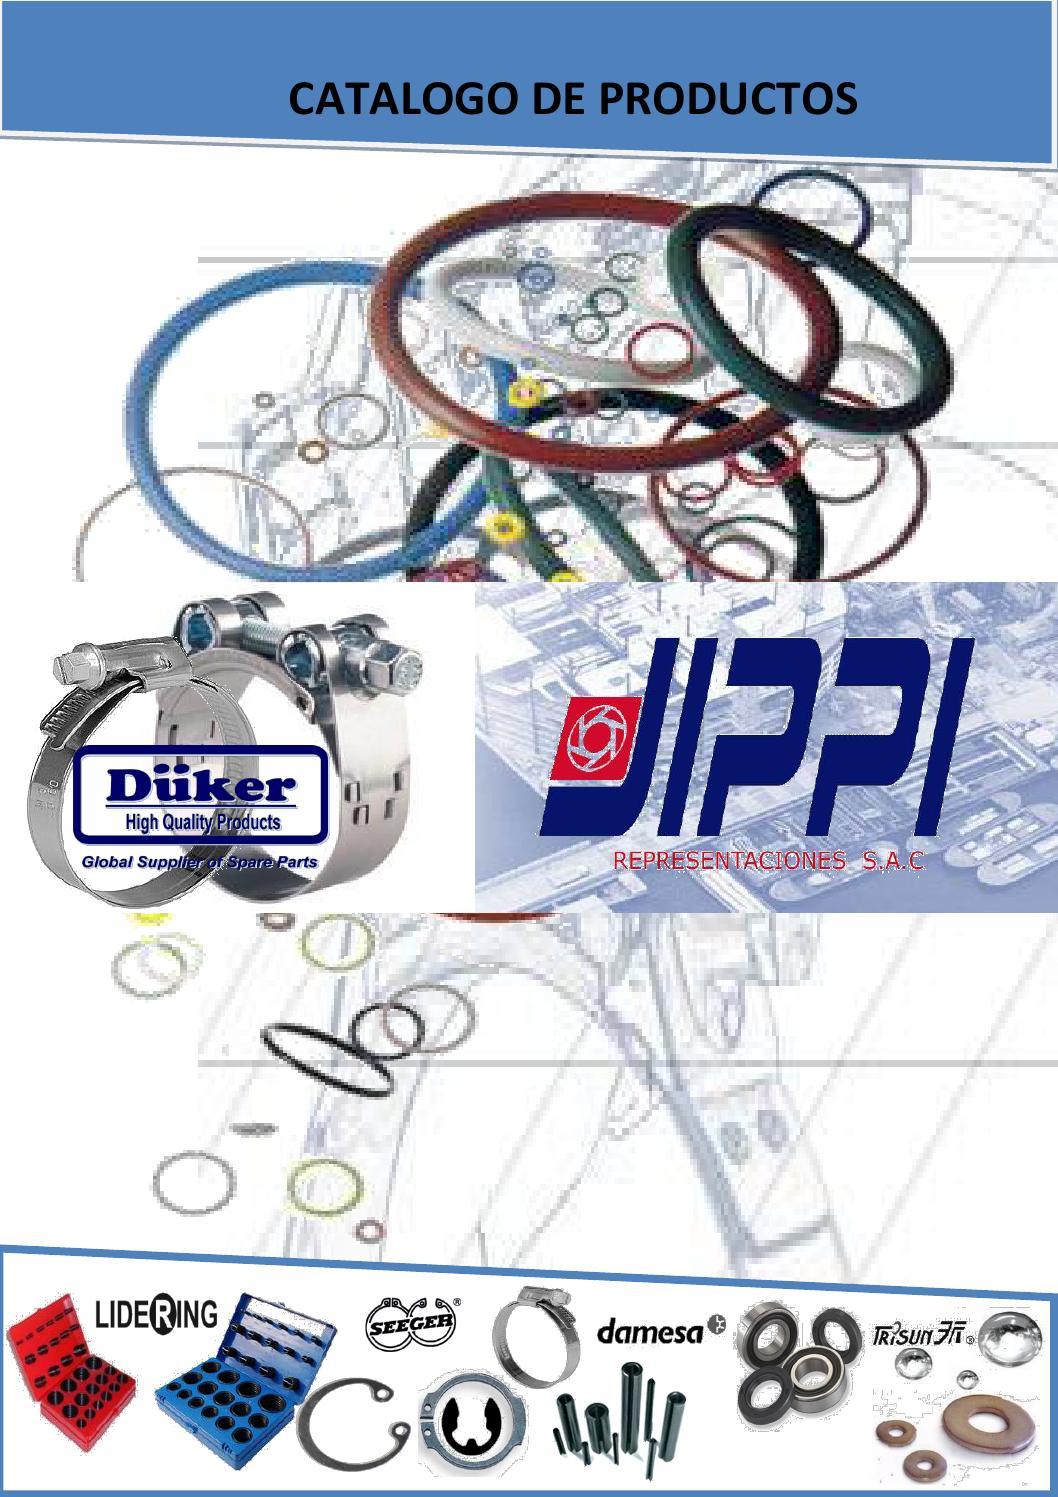 Catalogo general jippi representaciones sac by jippisac for Catalogo pdf